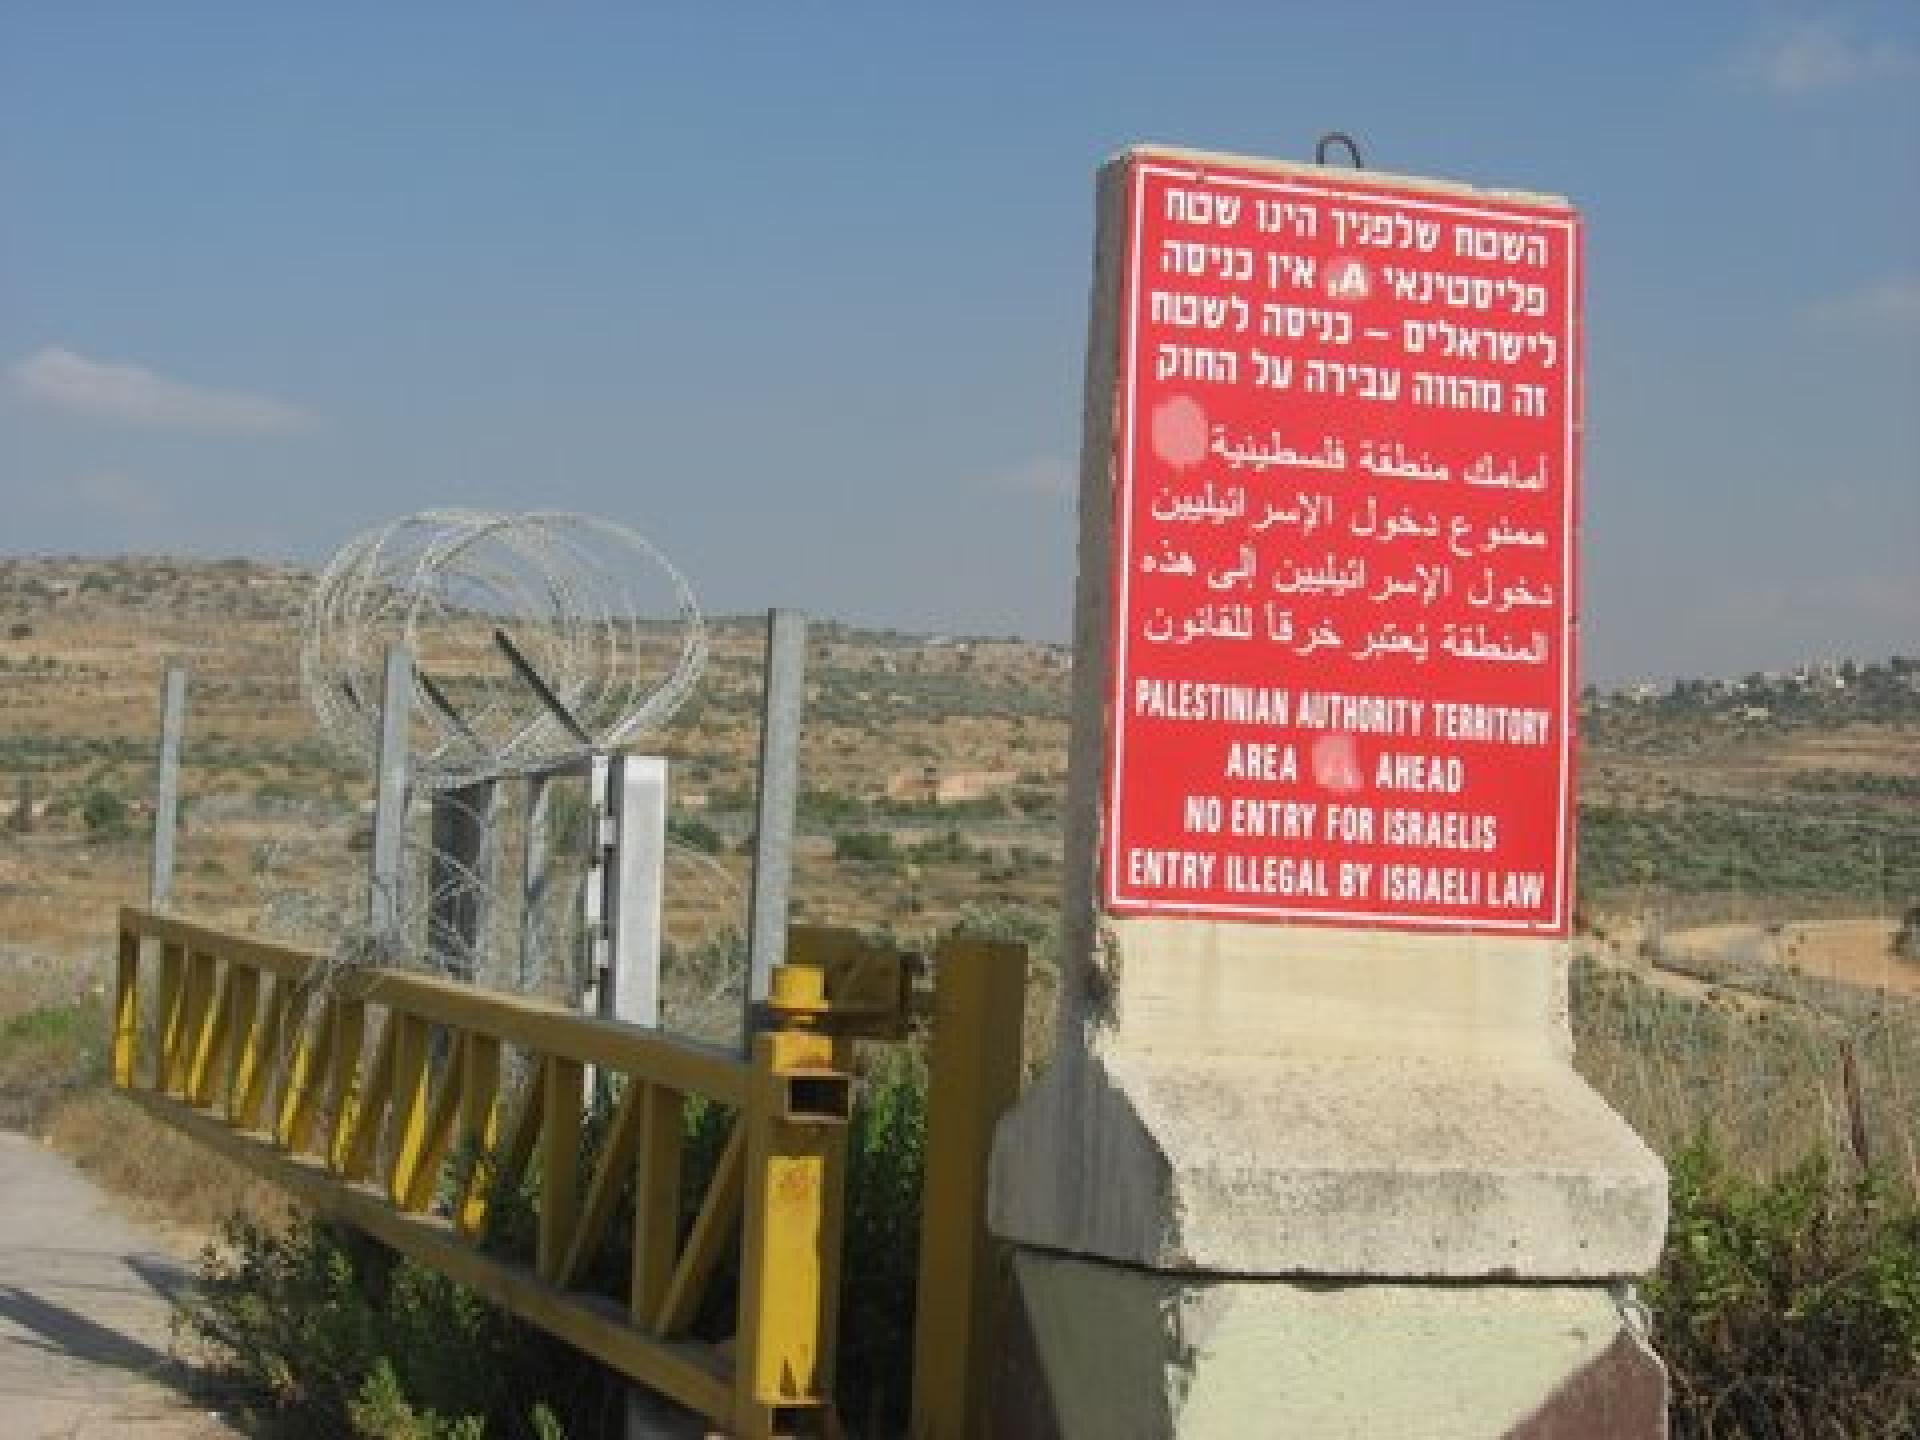 Jubara/gate 753 15.06.11